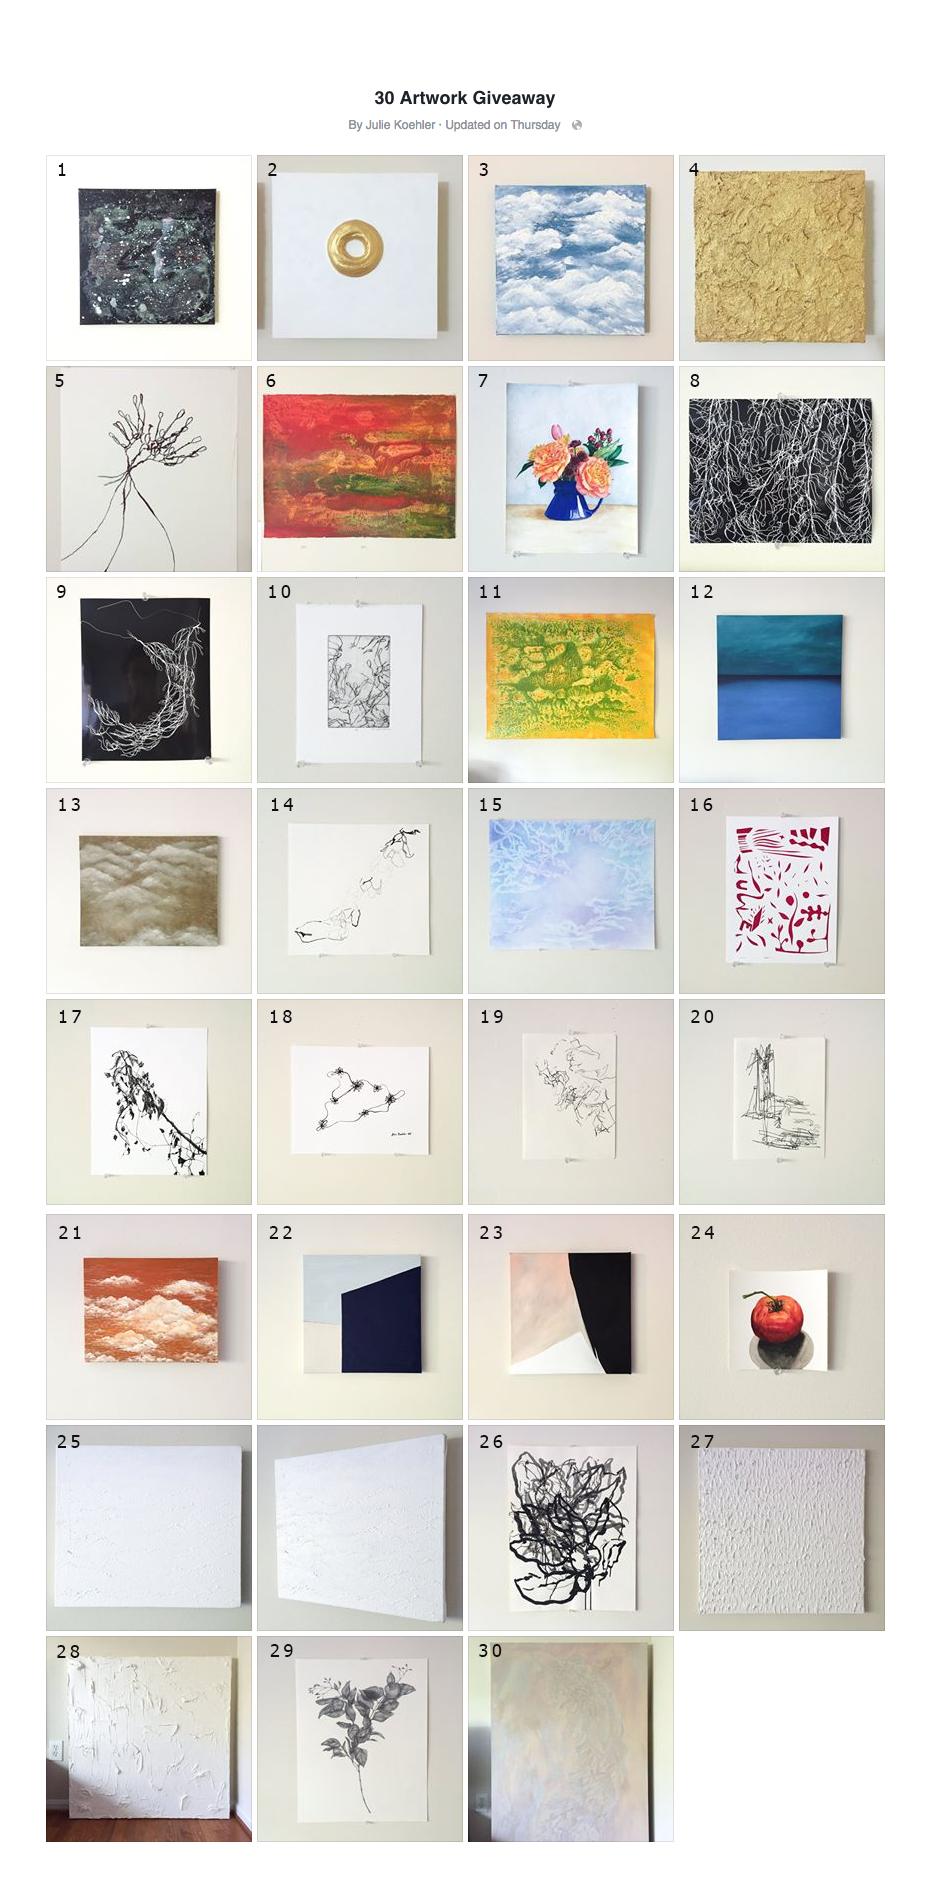 30-artwork-giveaway